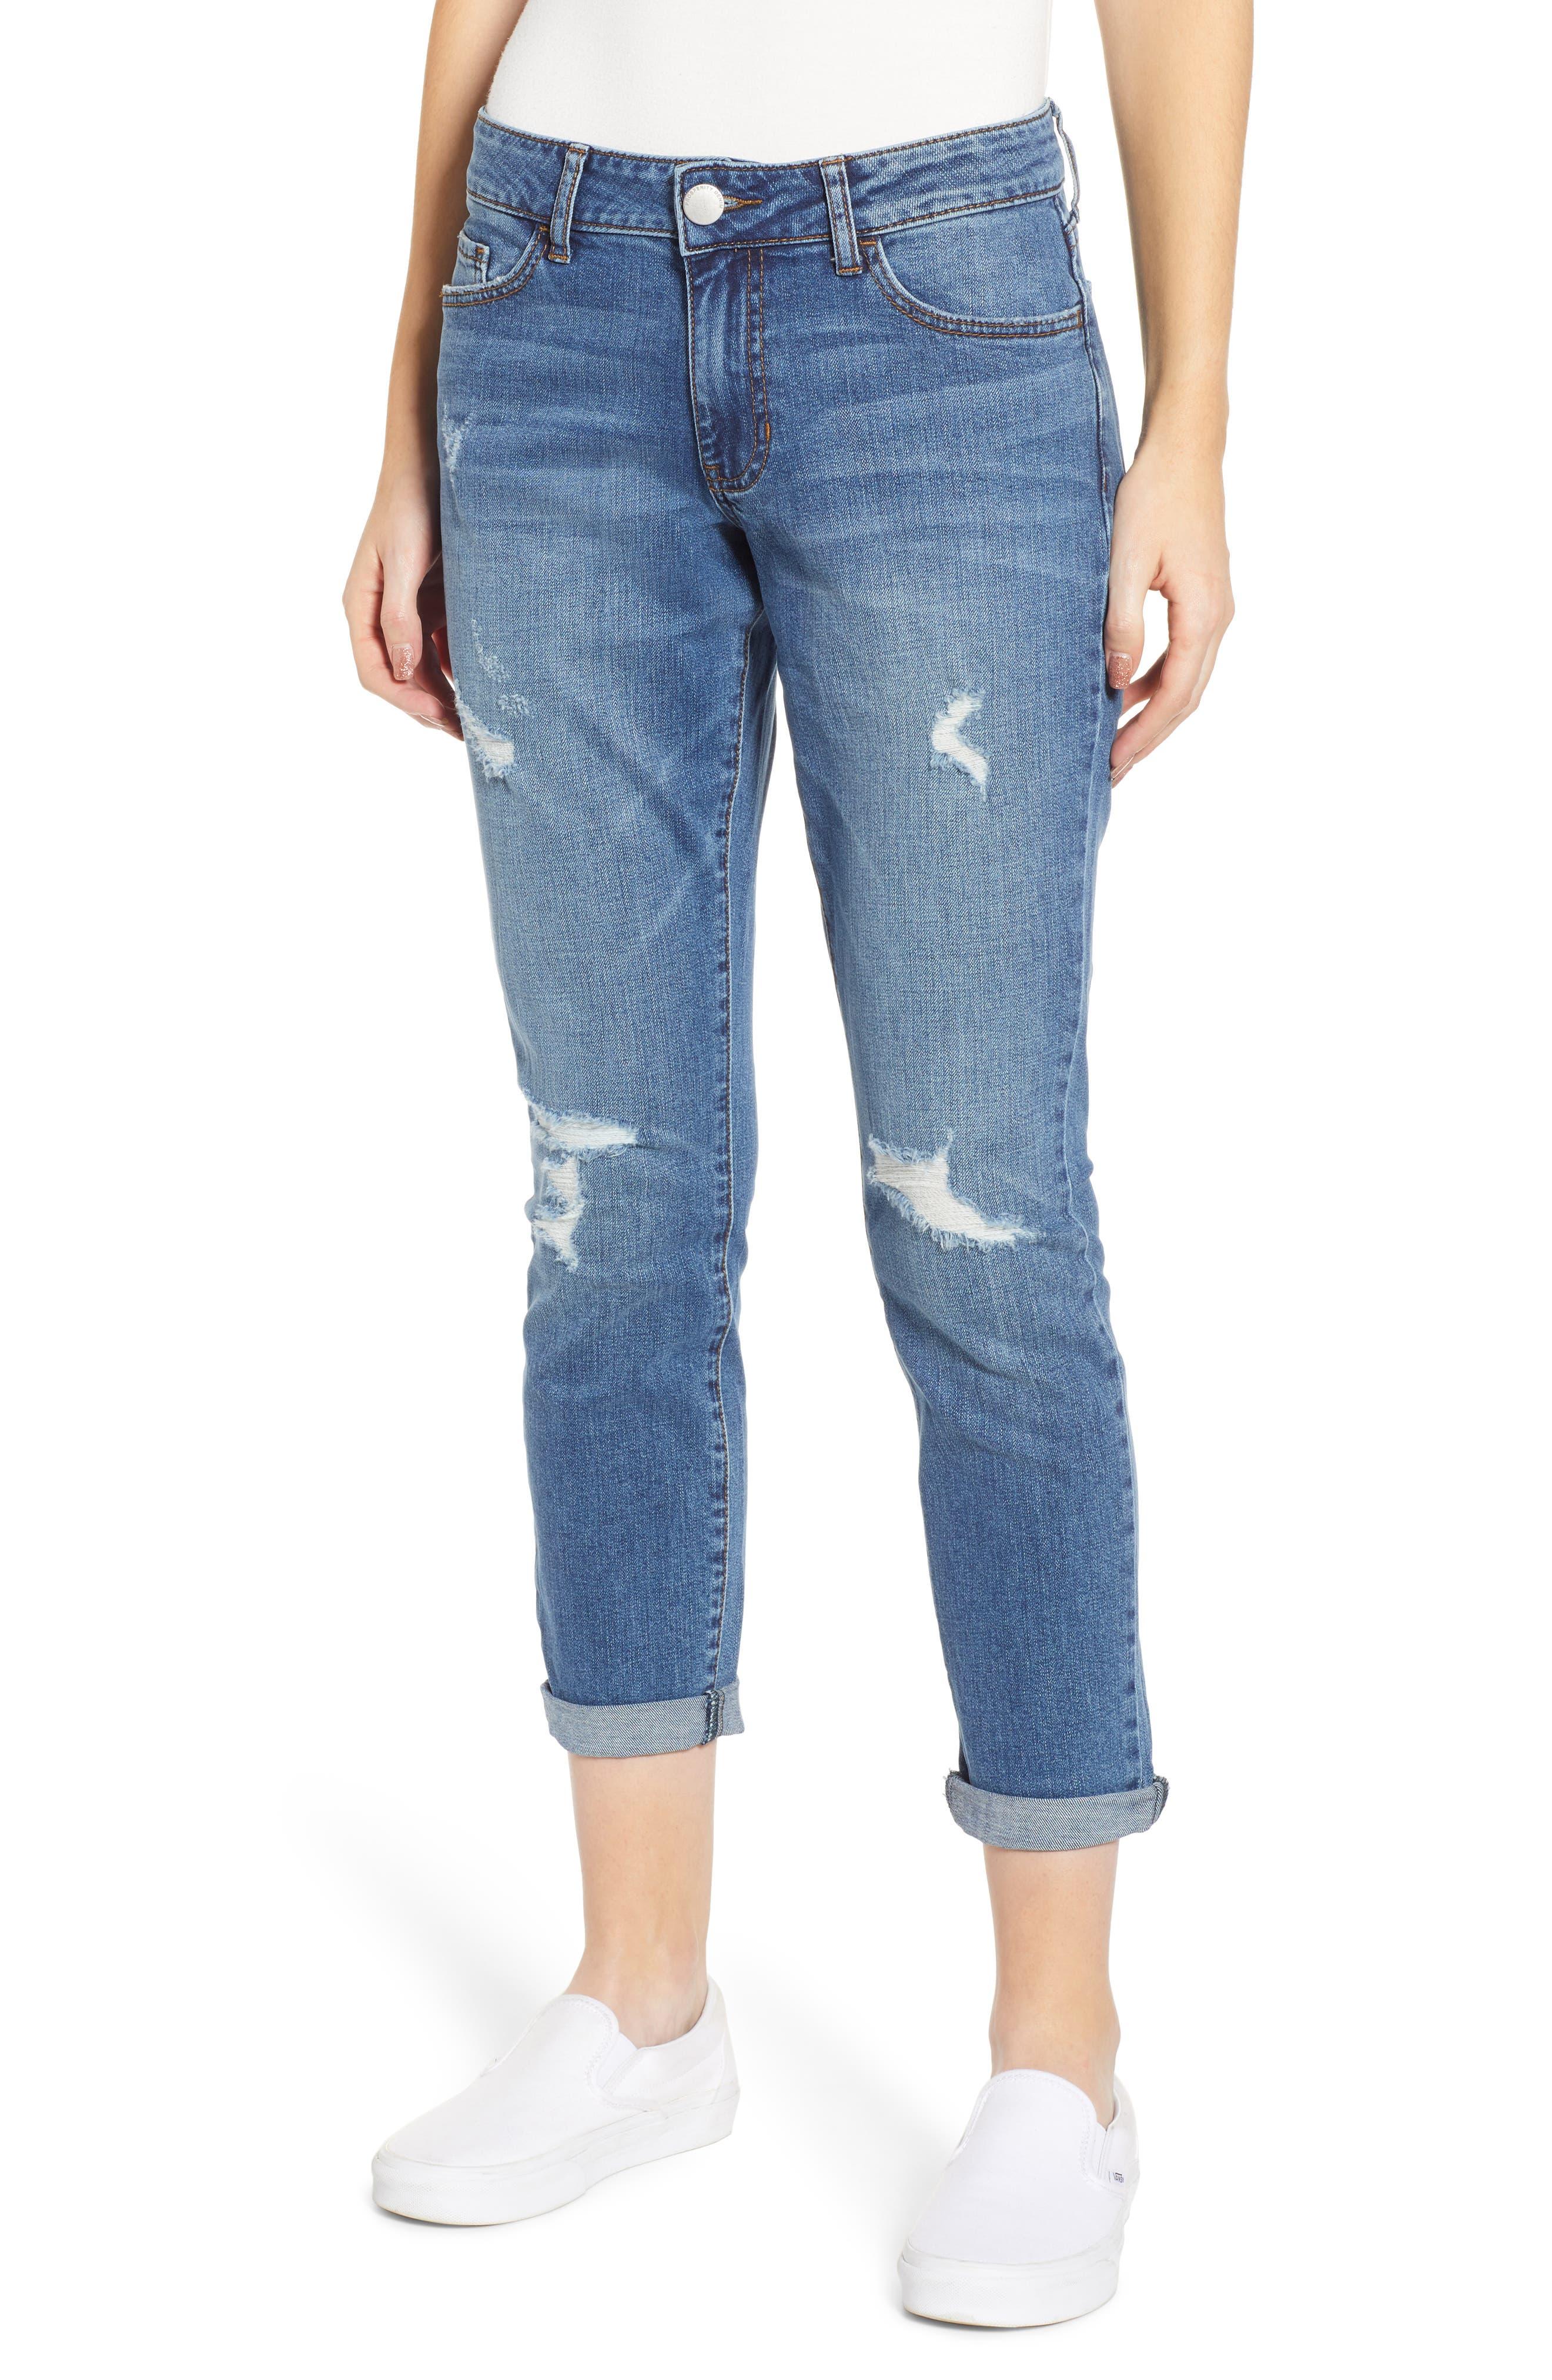 PROSPERITY DENIM Distressed Ankle Boyfriend Jeans, Main, color, MEDIUM WASH